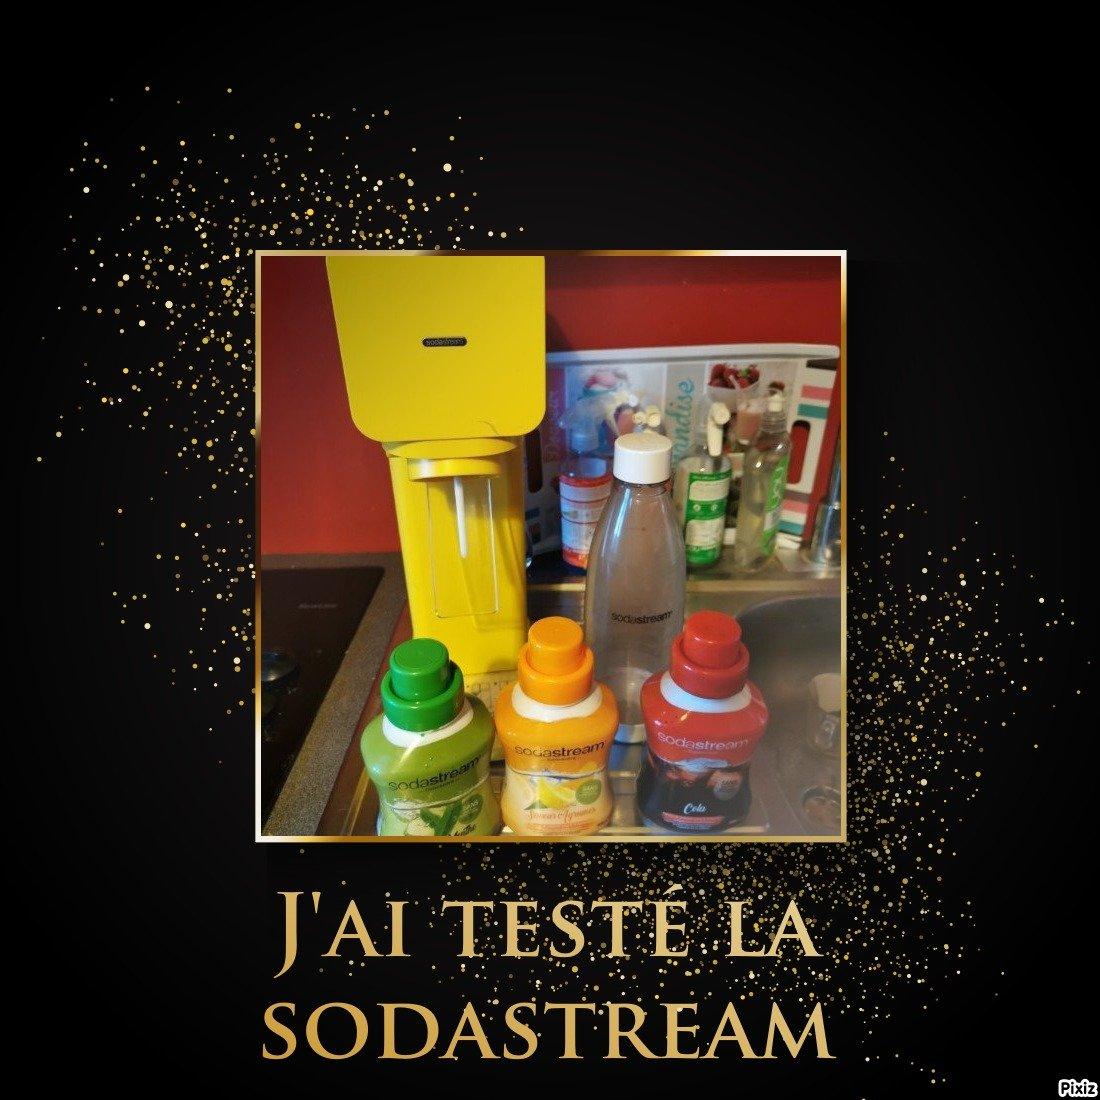 j'ai testé la sodastream